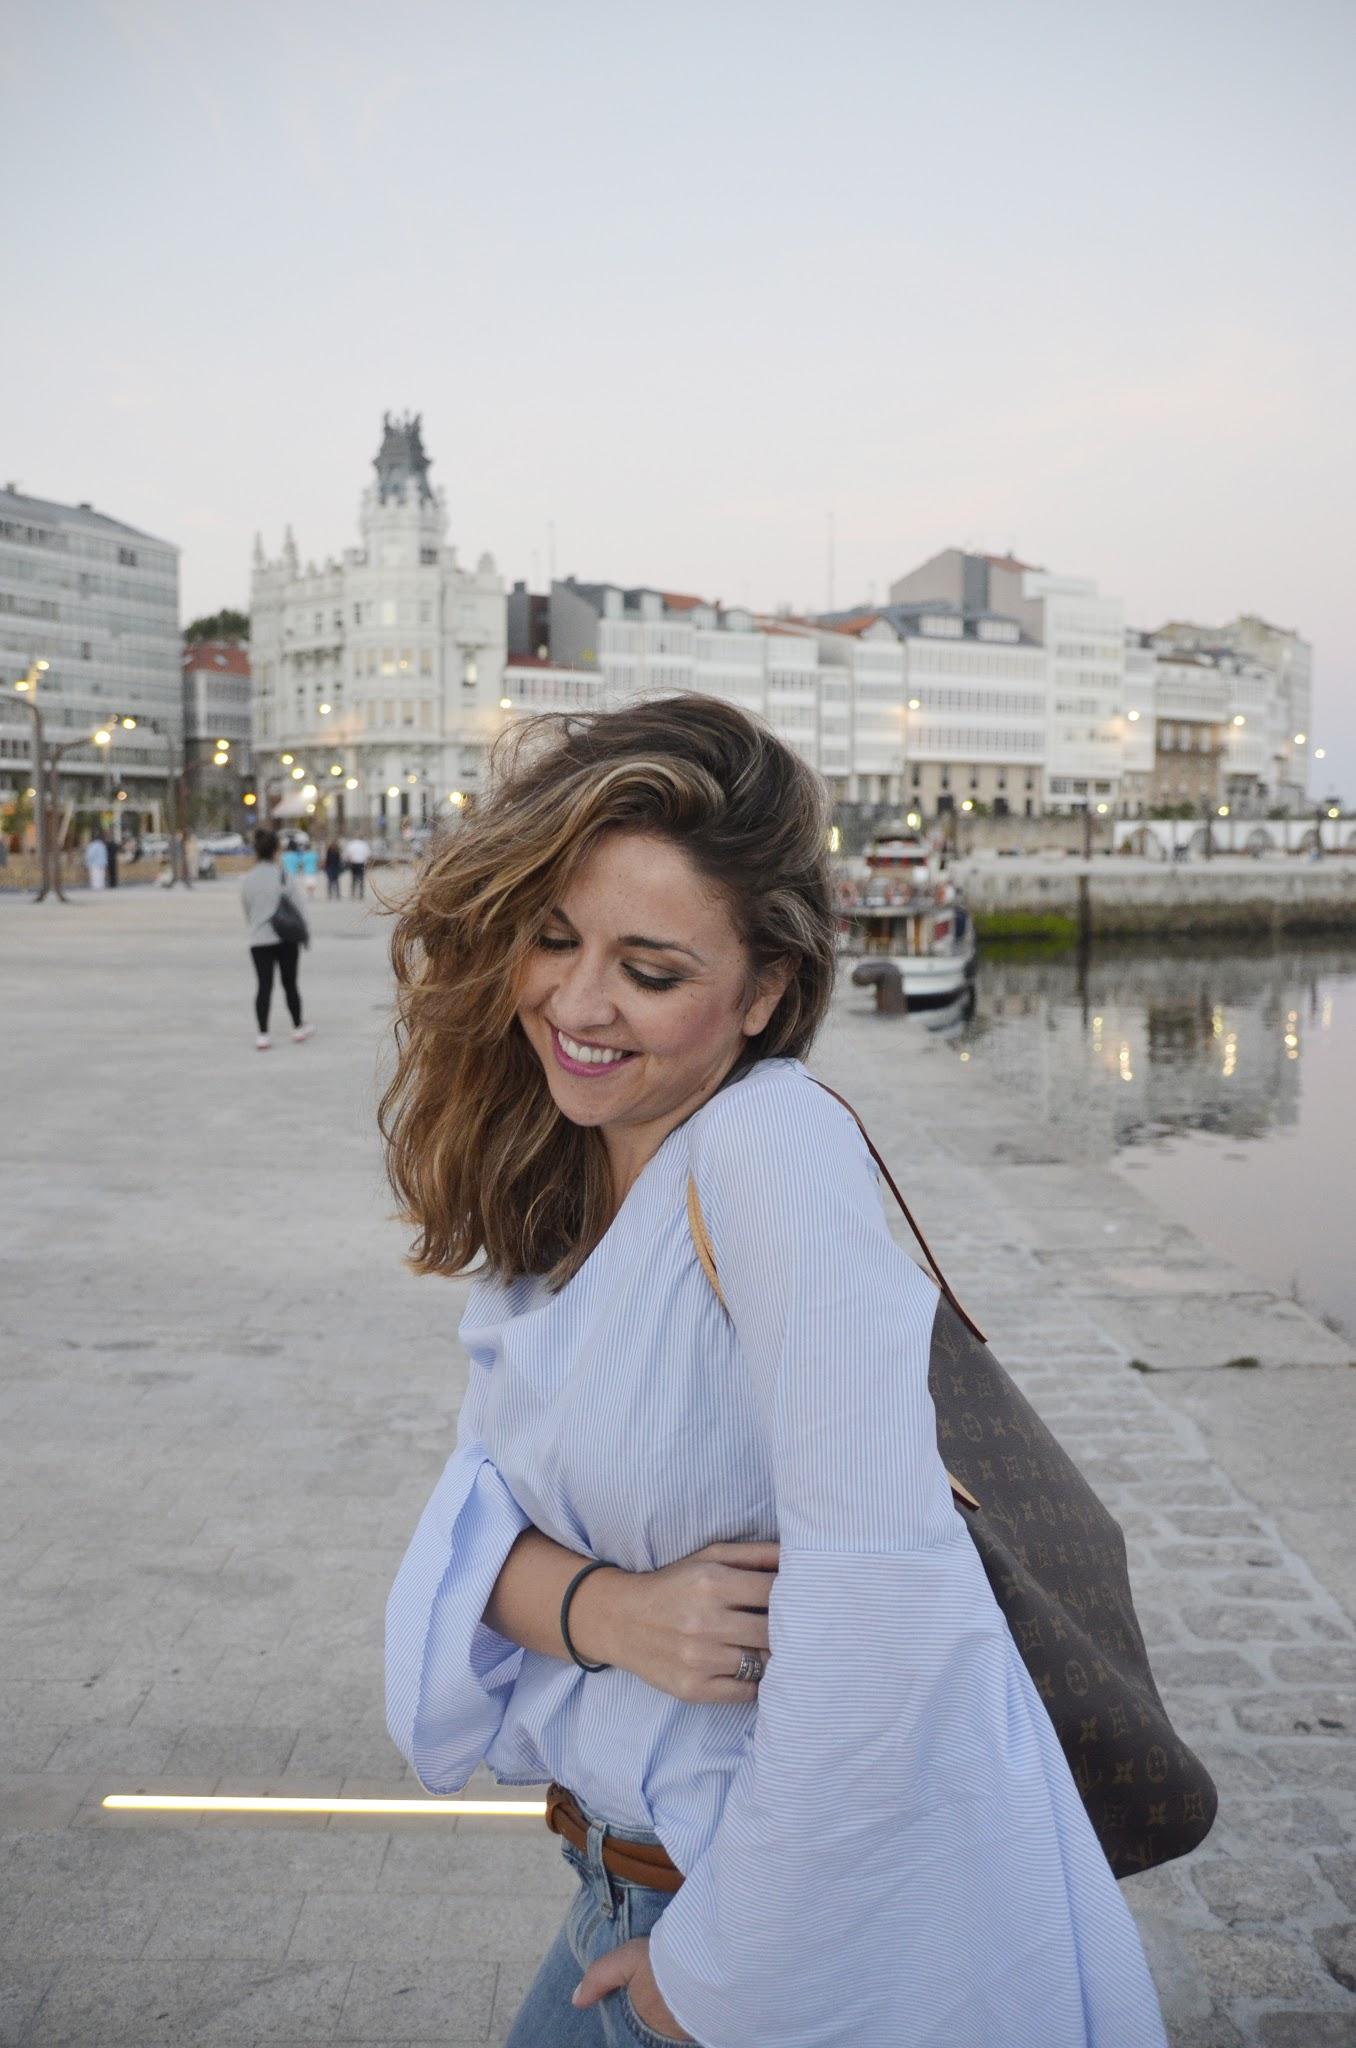 flared-blouse-zara-blogger-tarasessence